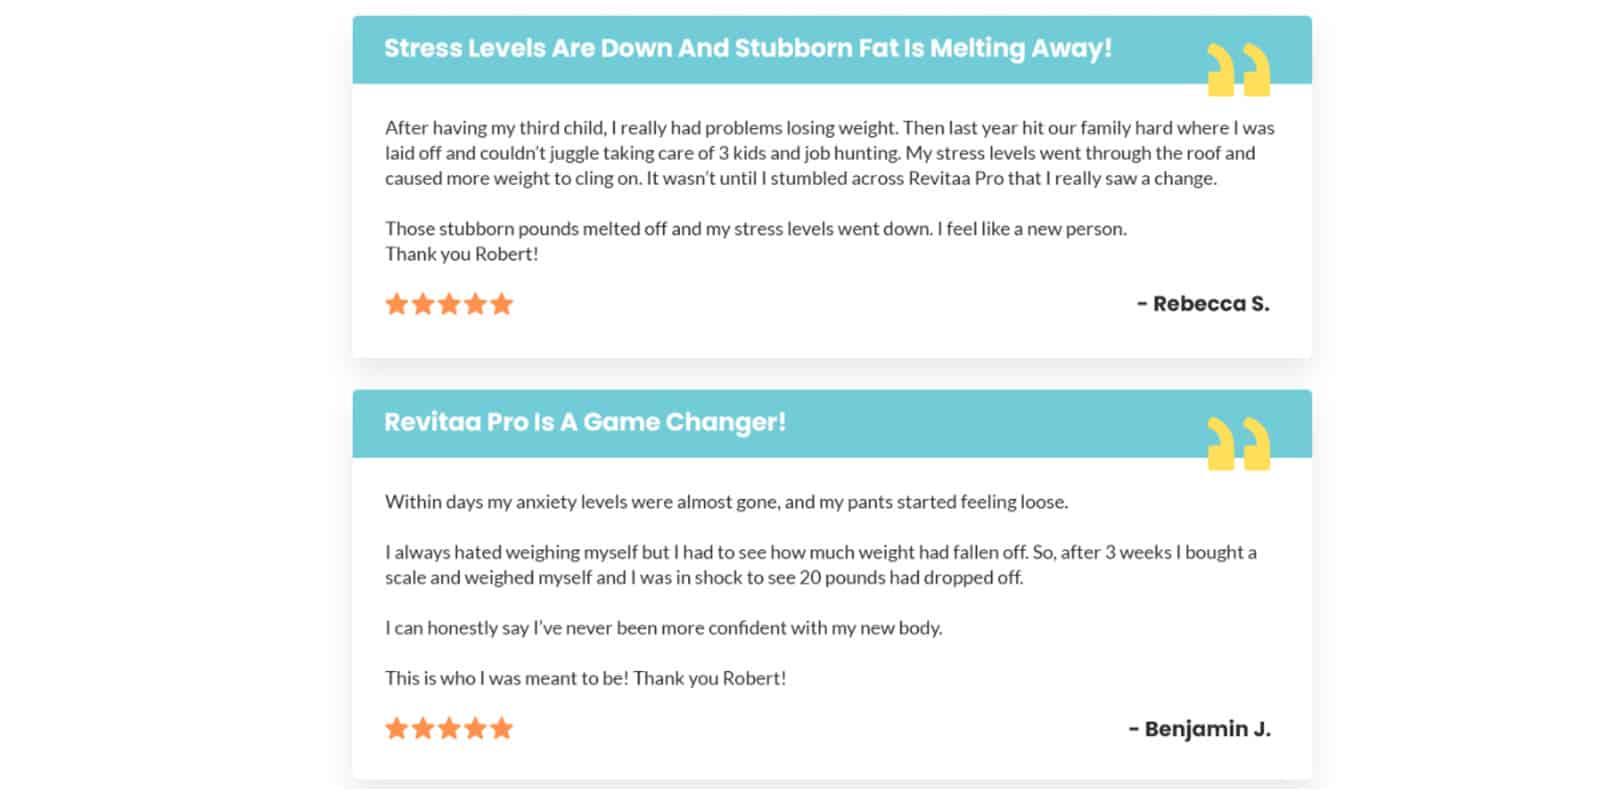 Revitaa Pro Customer Reviews